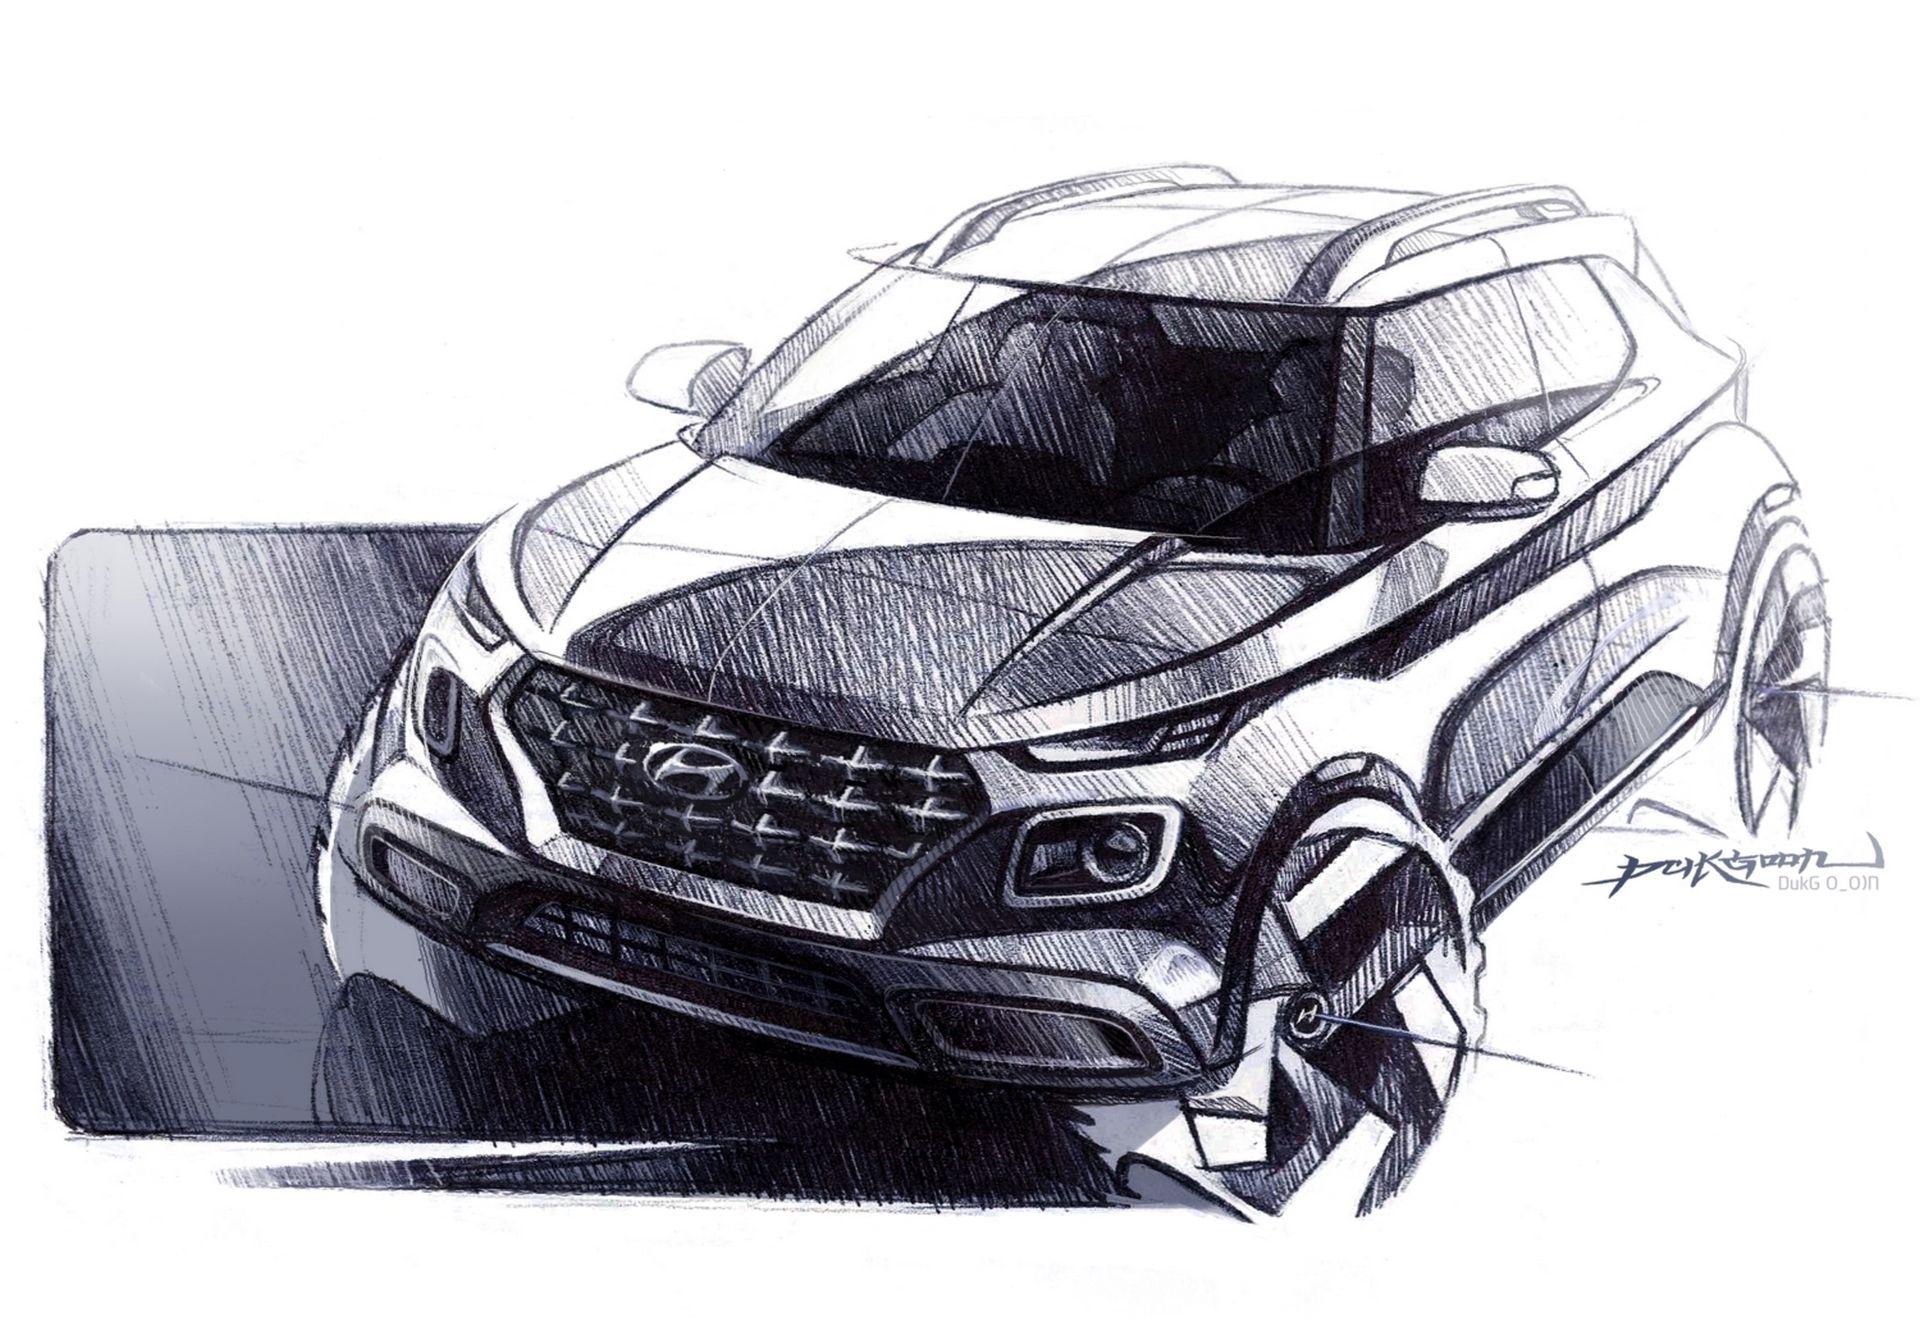 Hyundai Venue - Teaser